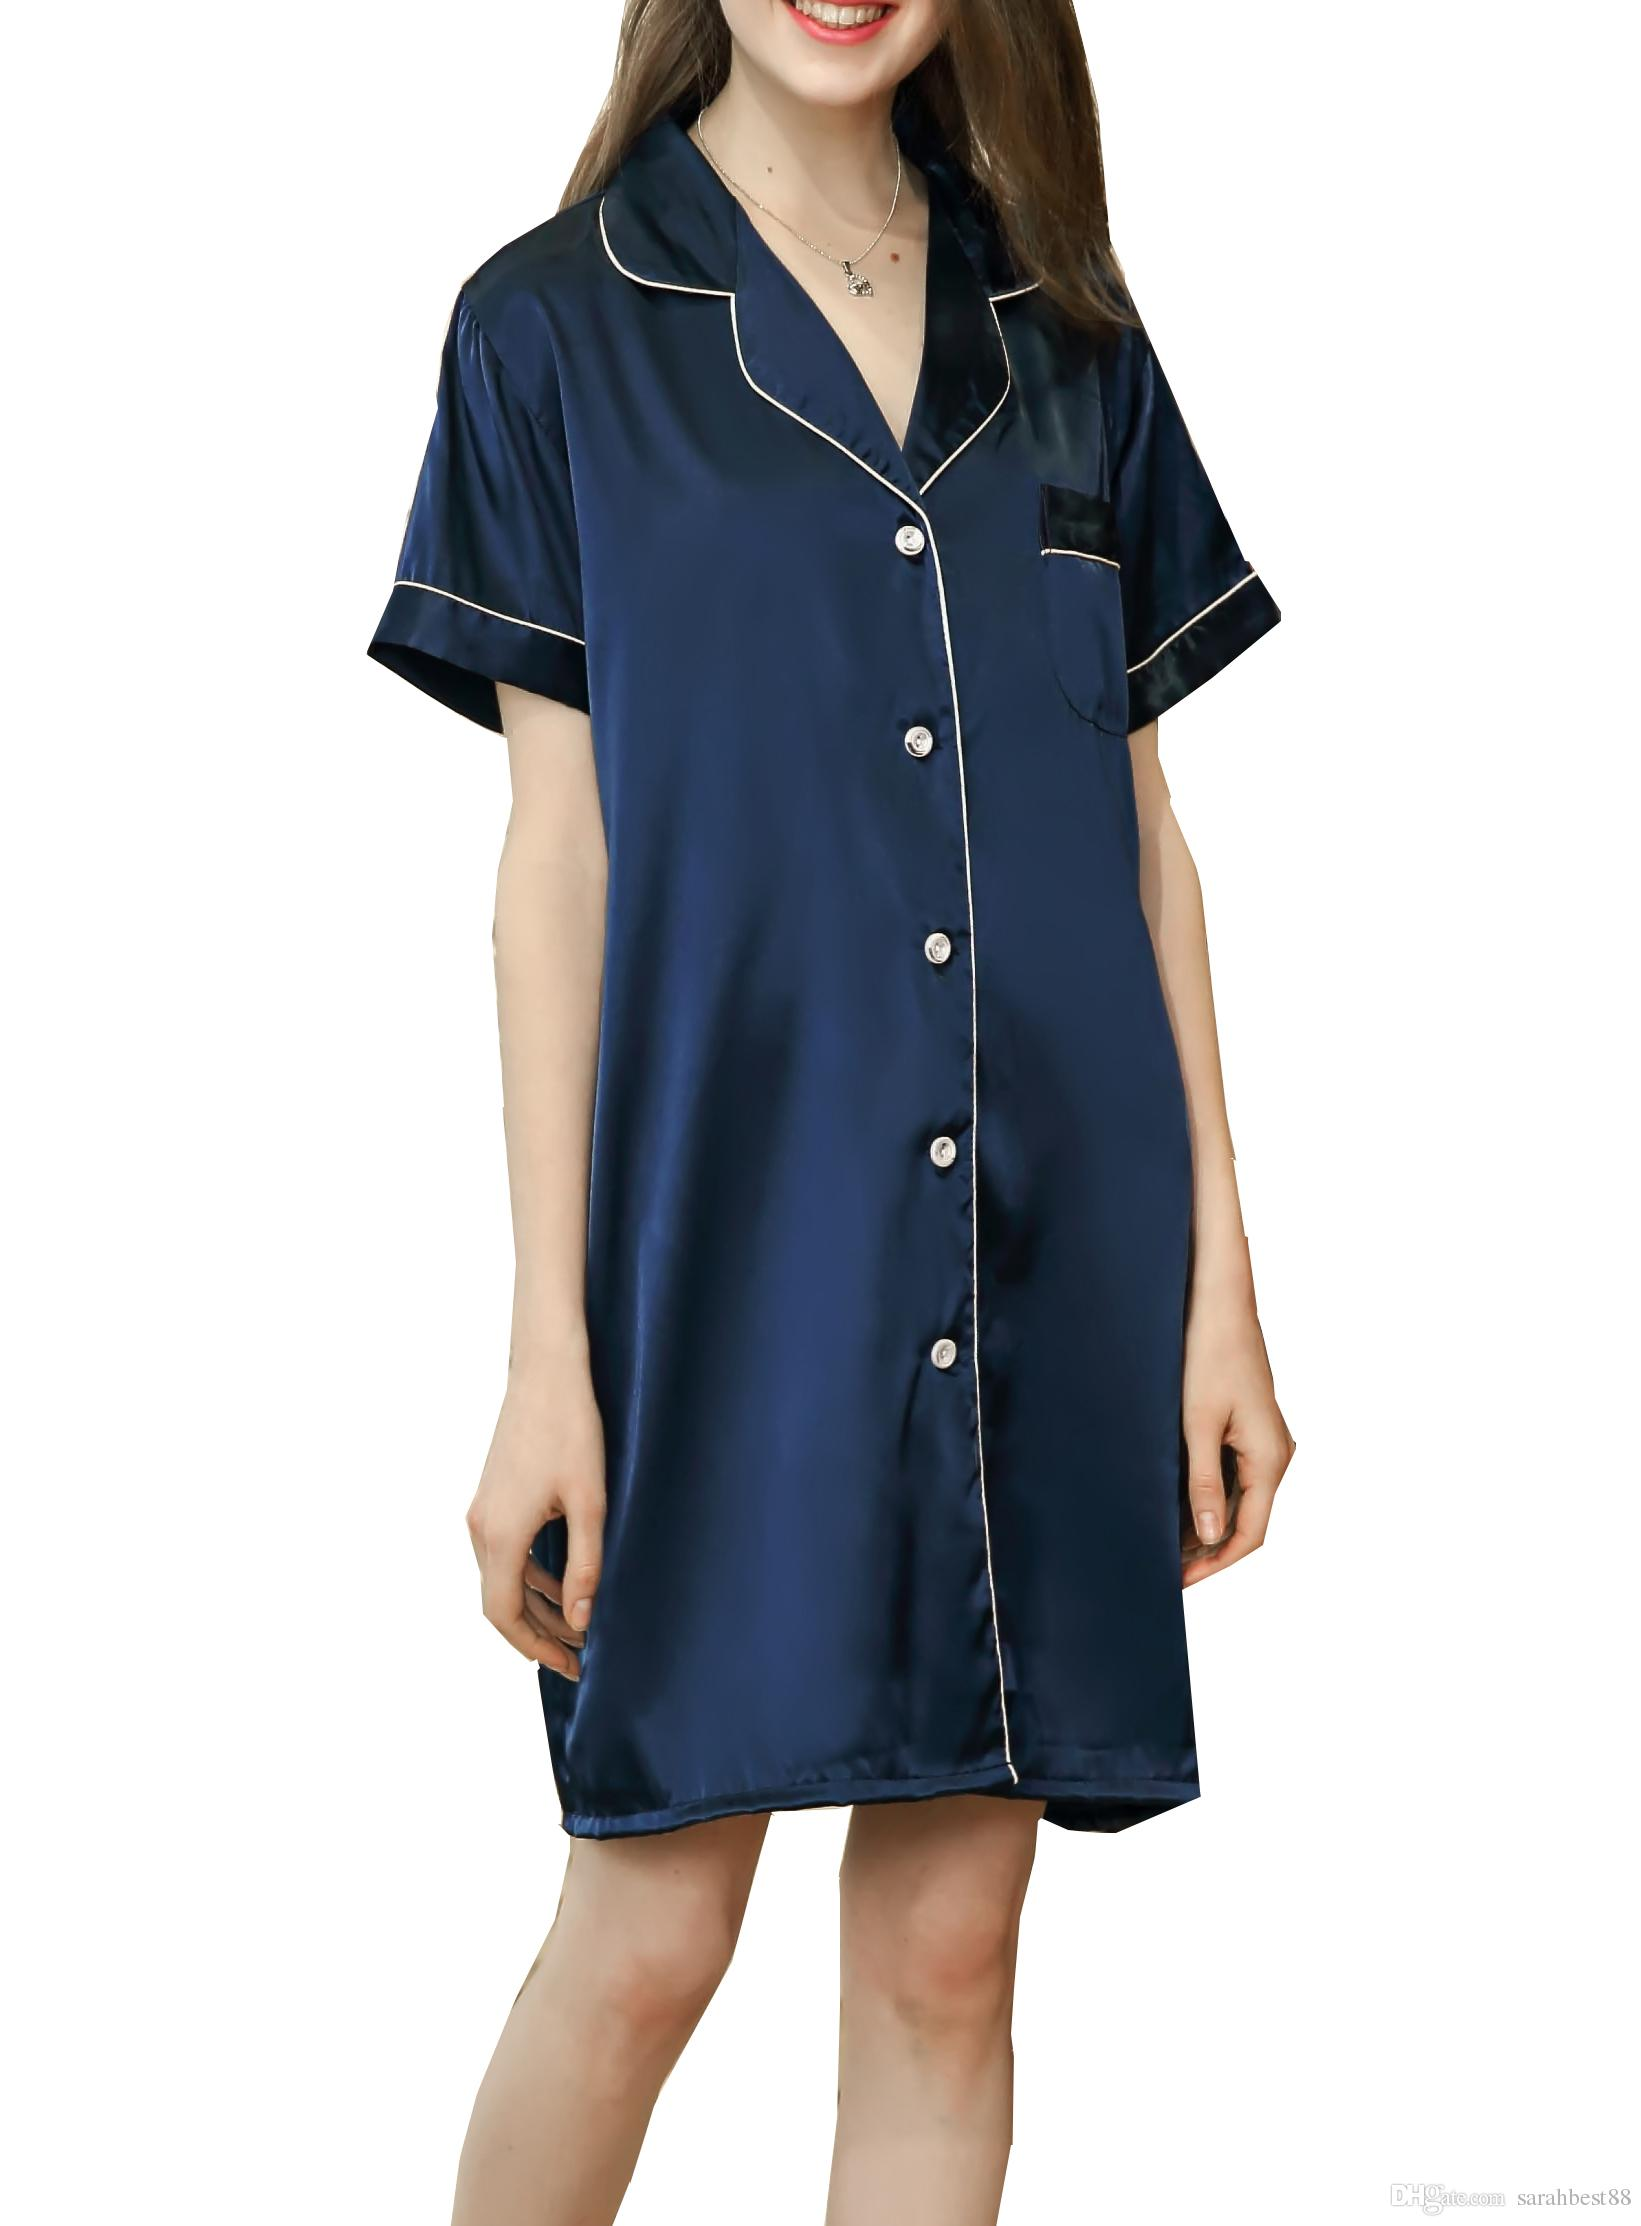 Women Girls Nightshirt Elegant V Neck Short Sleeves Button Front ... ac2026122